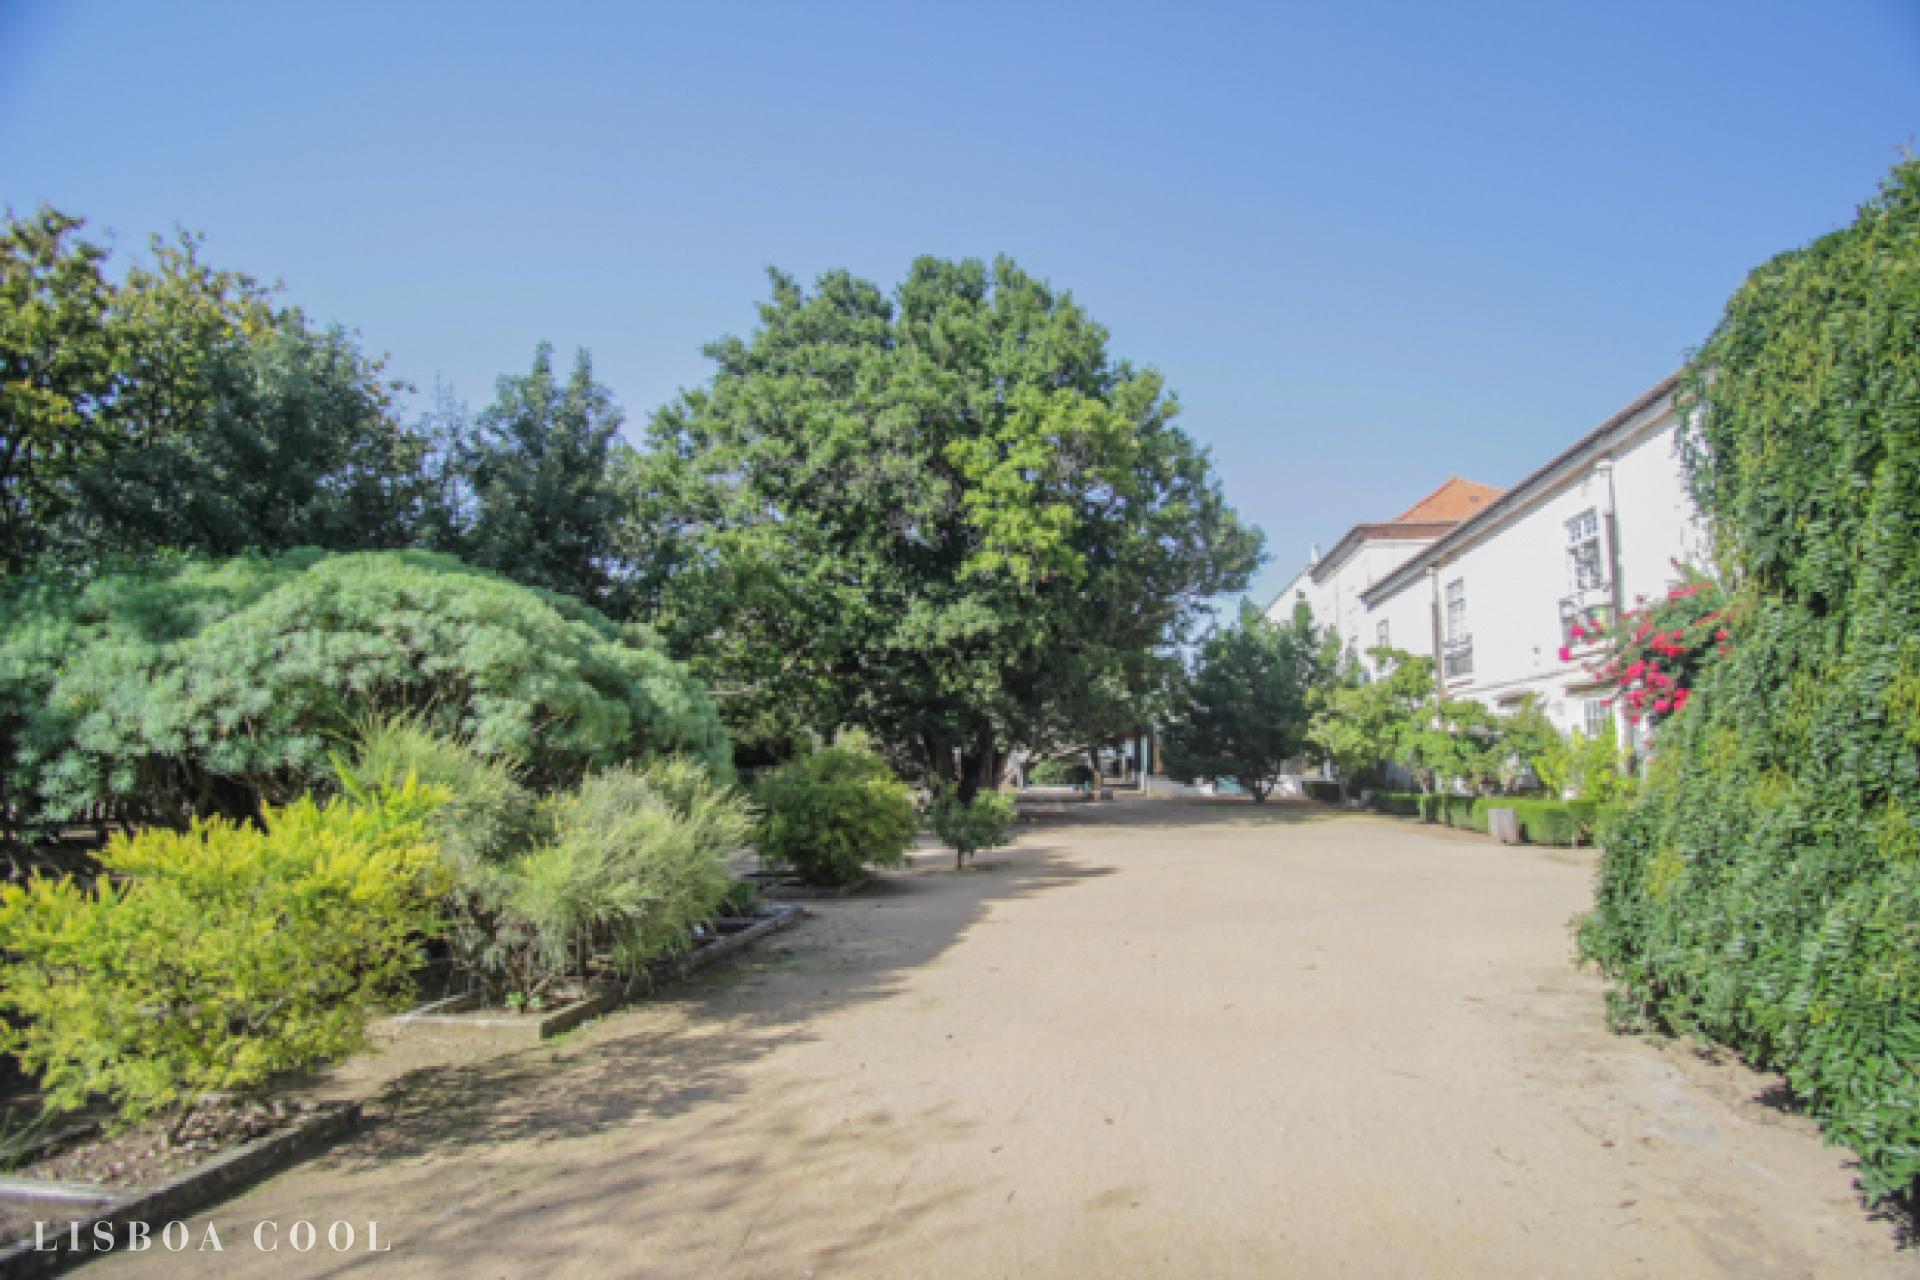 LisboaCool_Visit_Ajuda Botanical Garden